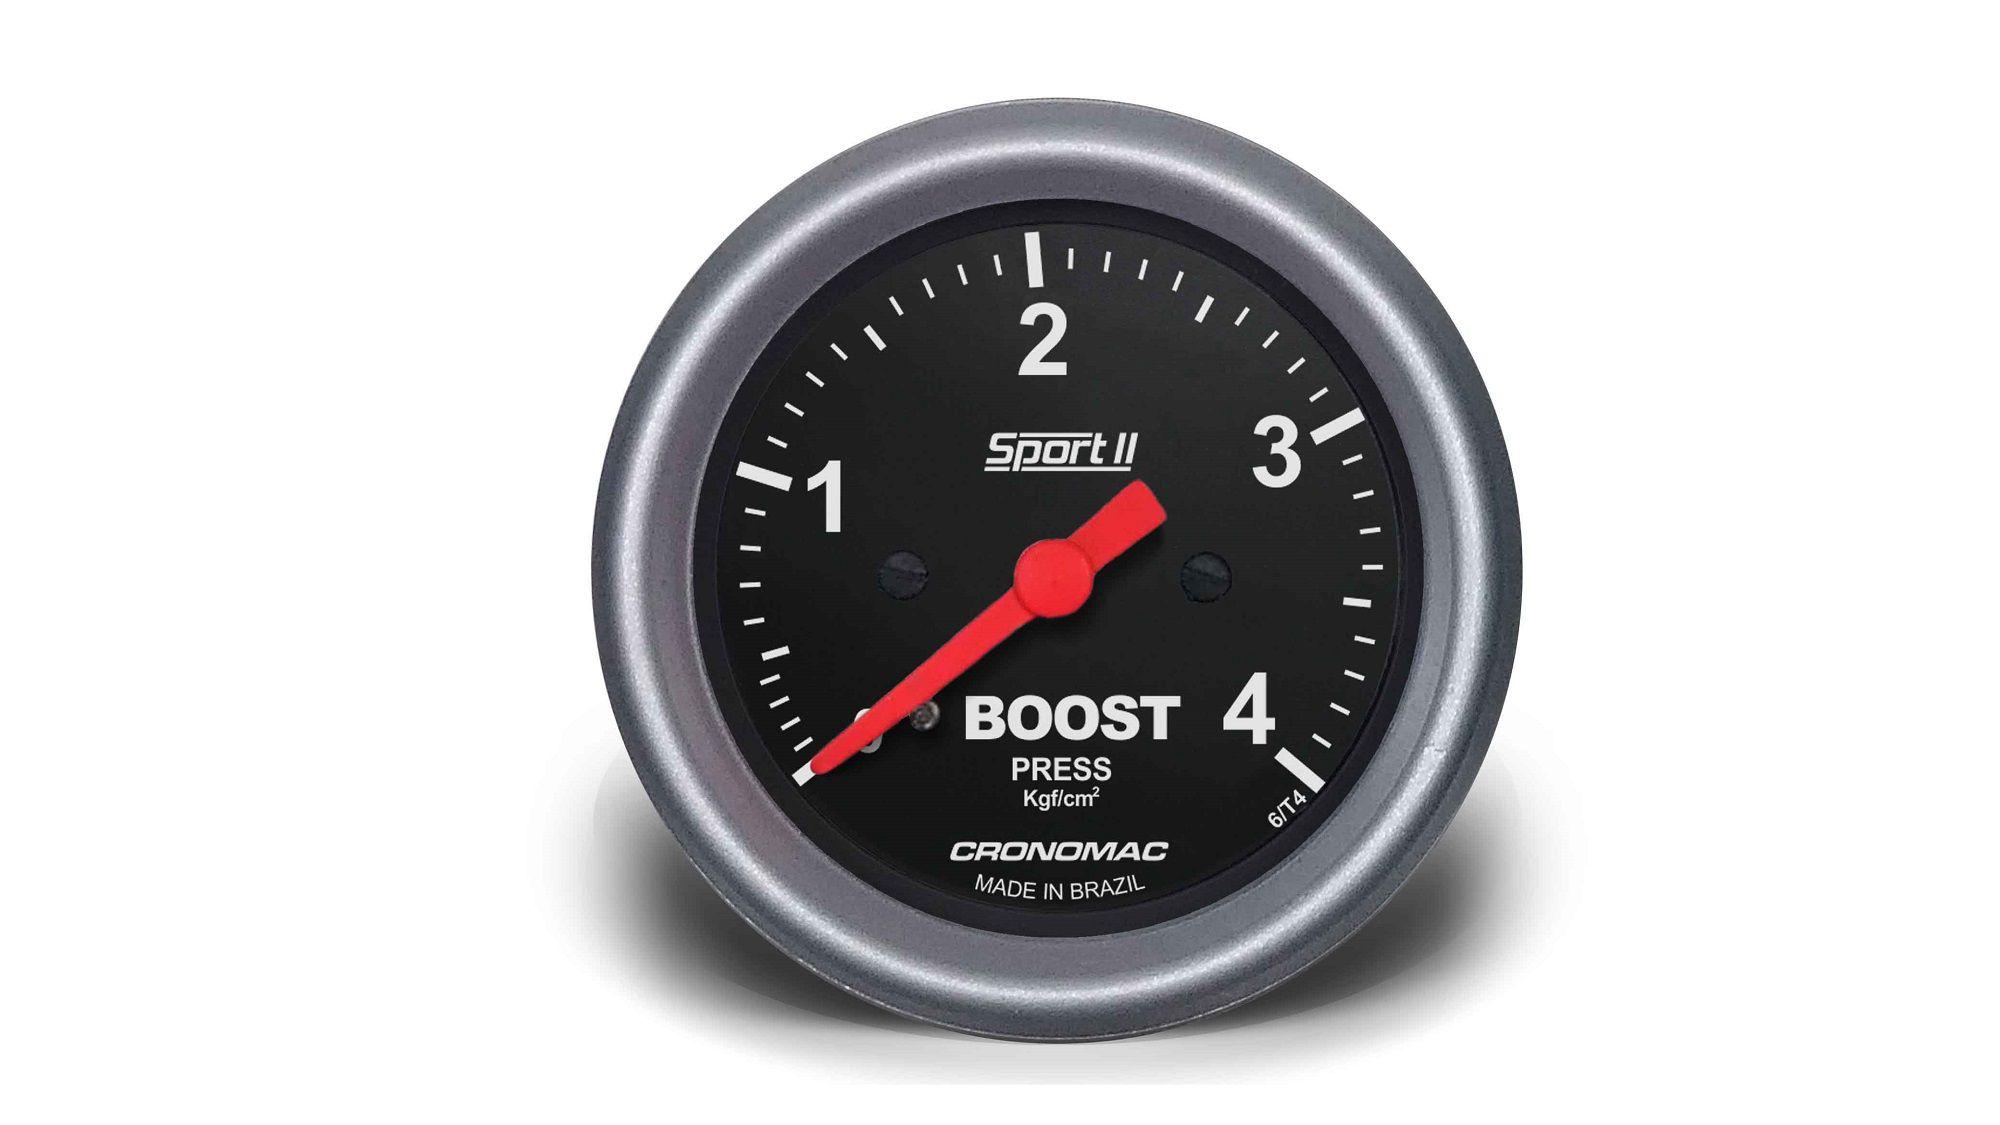 Relogio Pressao de Turbo 4kg Sport II 60mm Cronomac